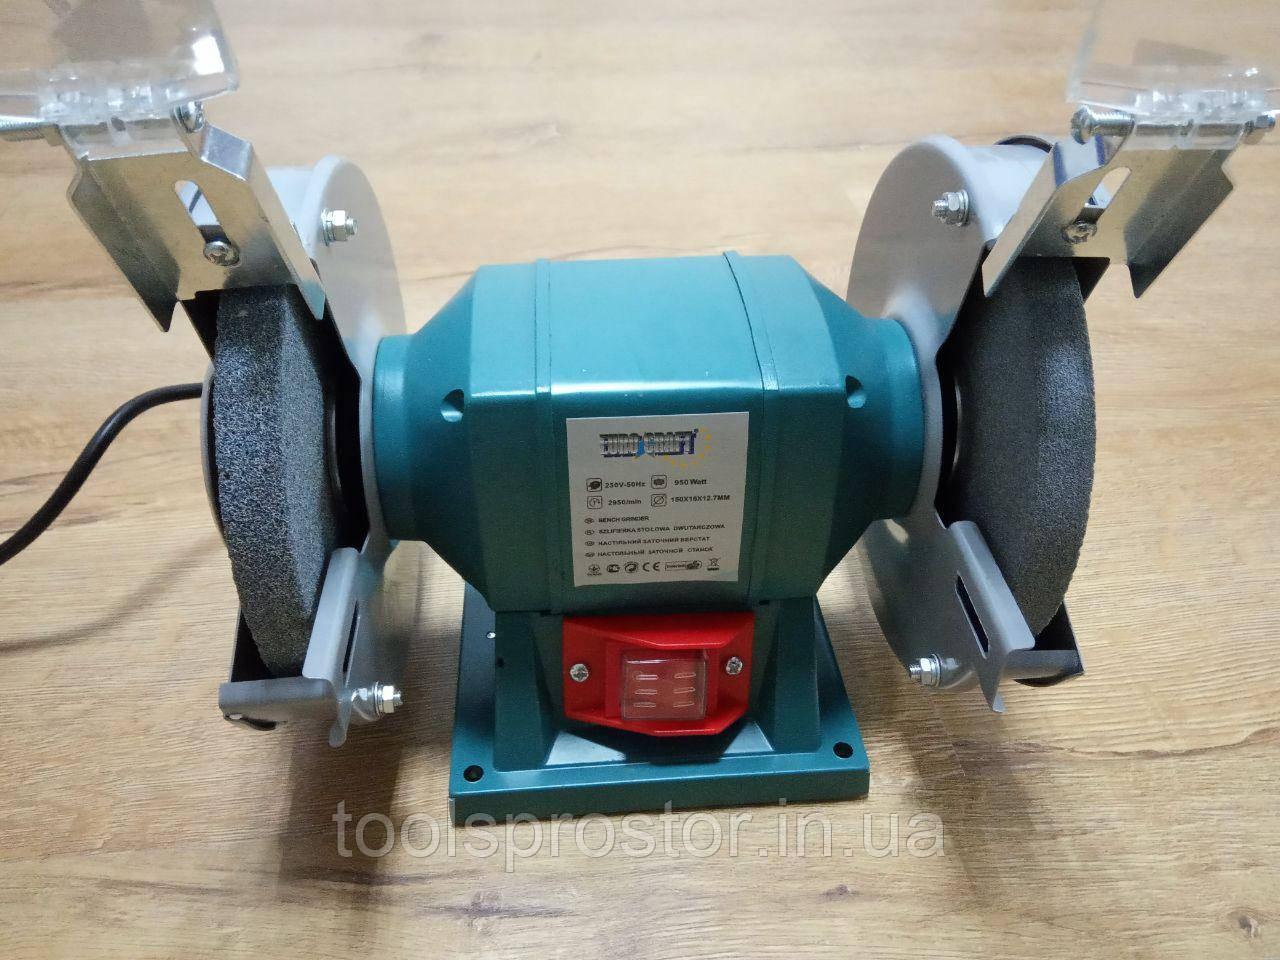 Точило Электрическое Euro craft BG202 : 1 Год гарантии